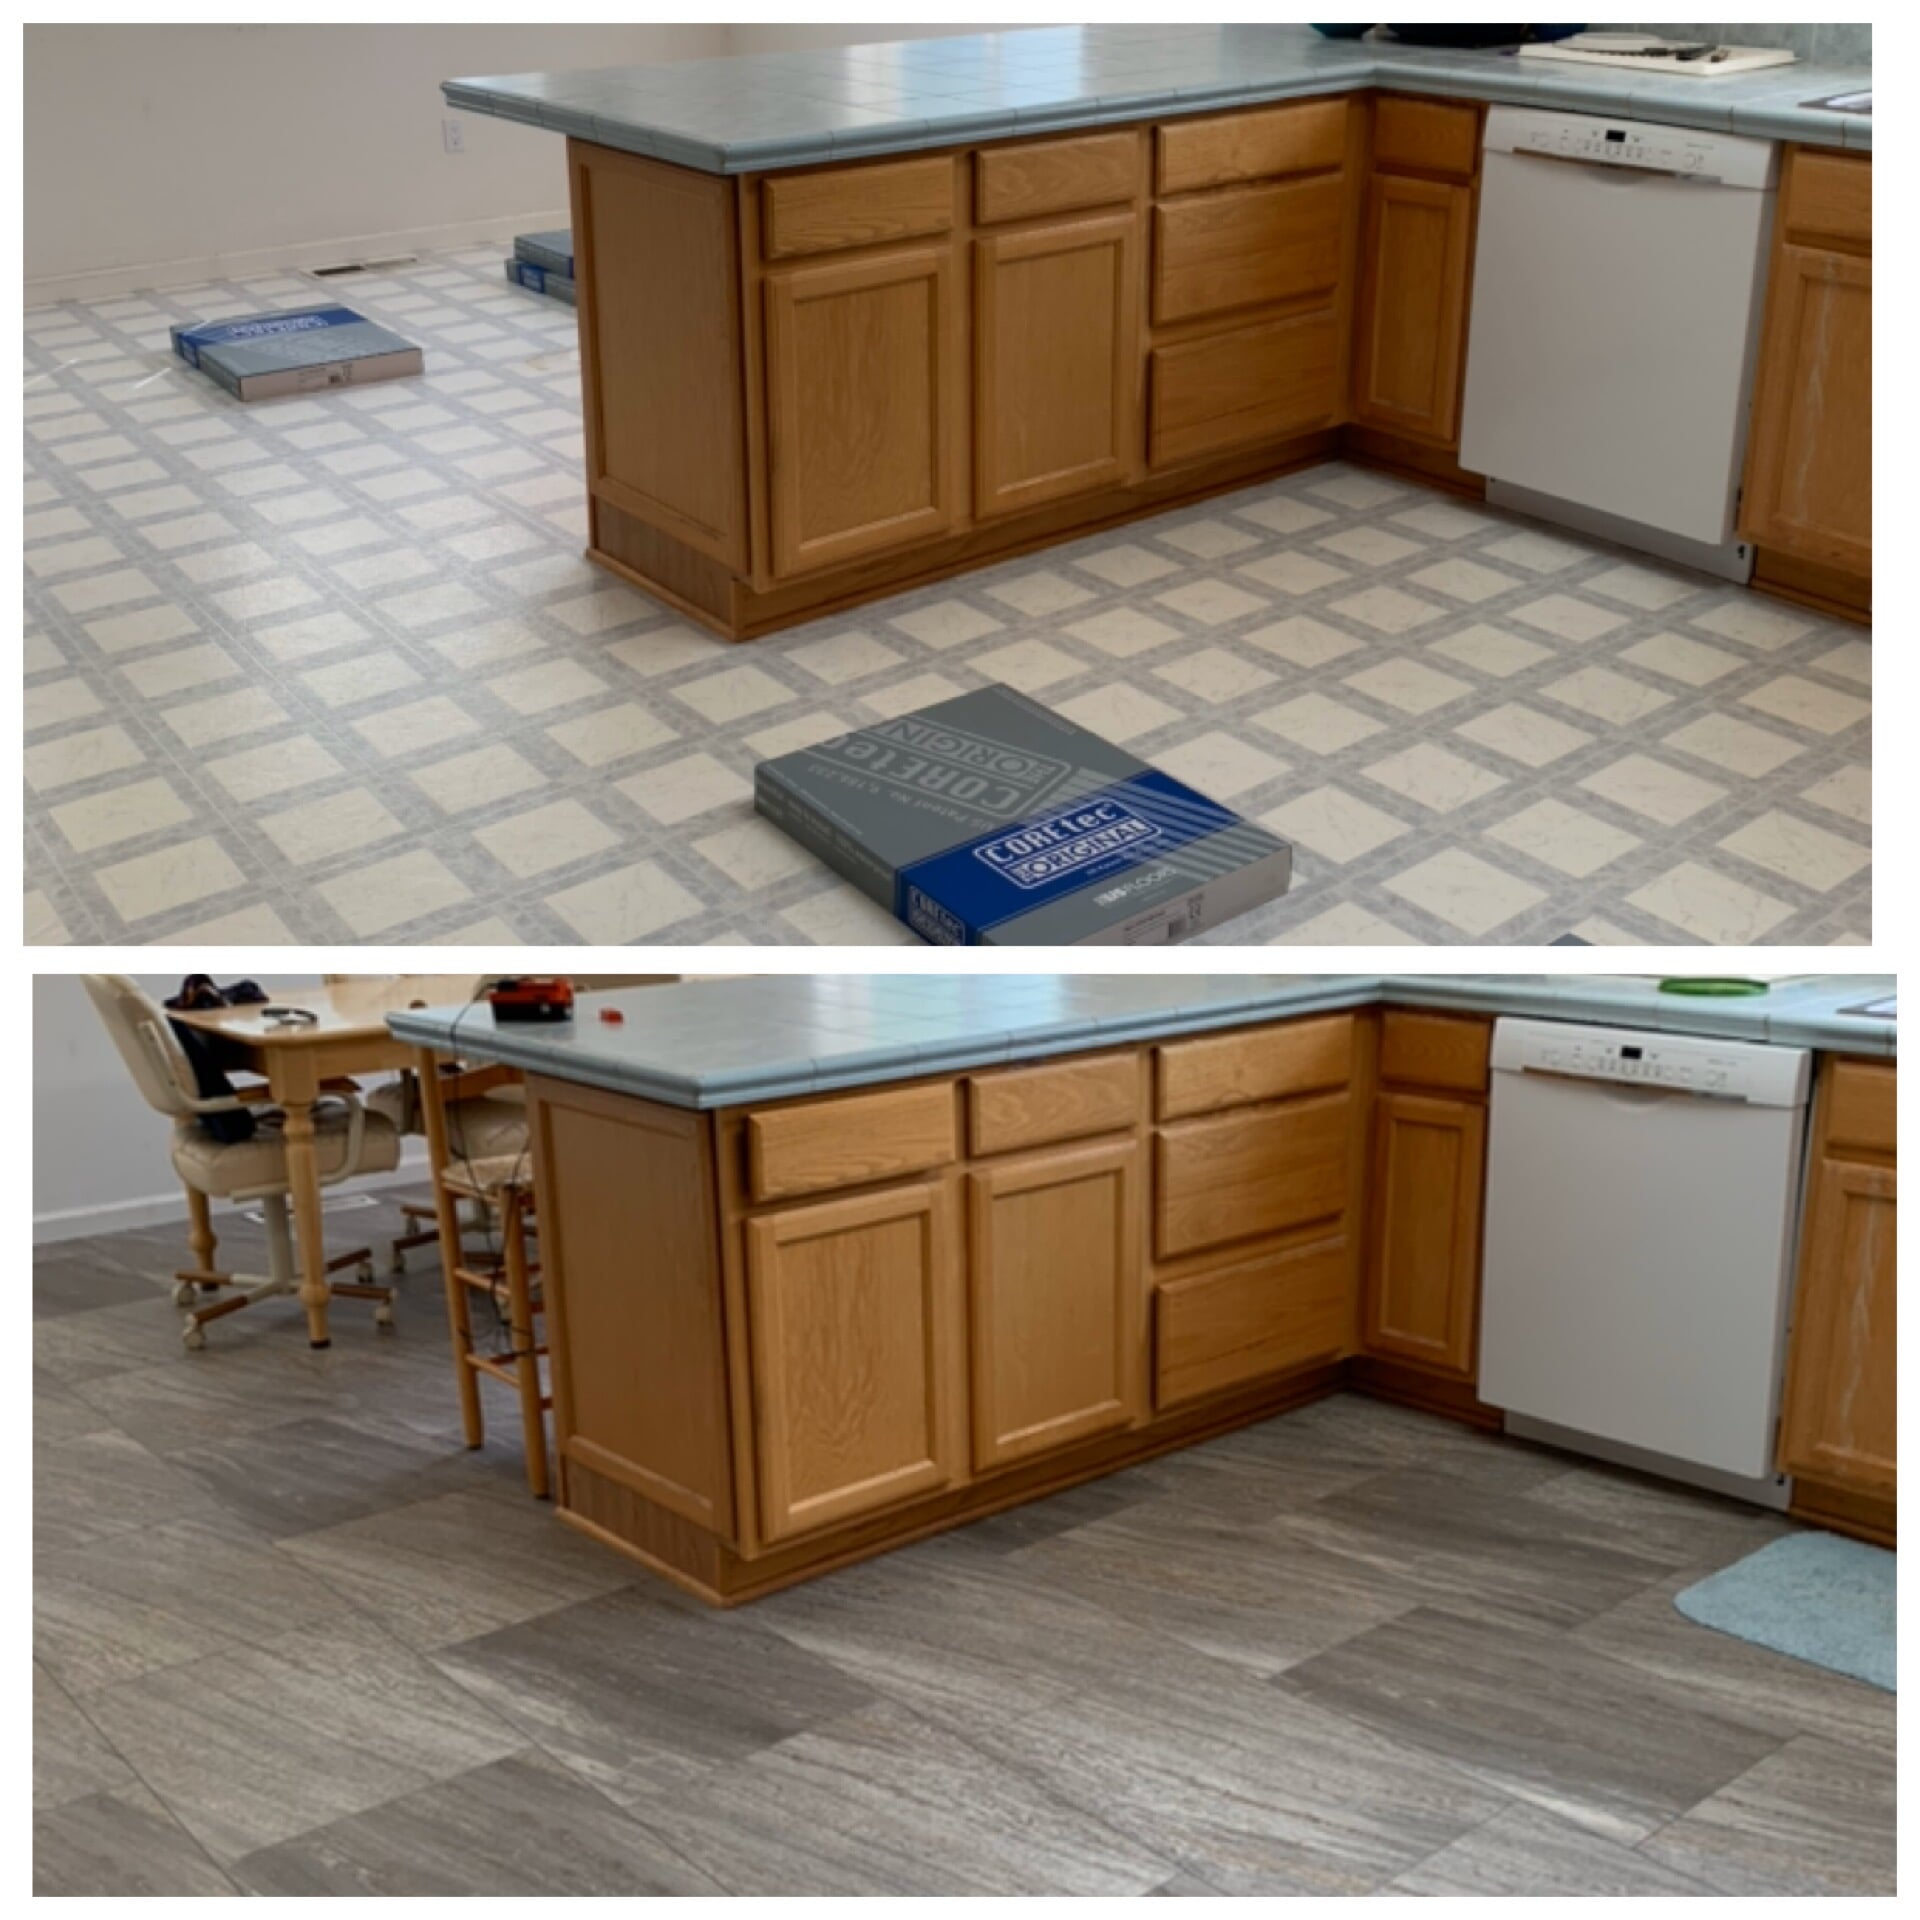 Tile flooring from Carpet King Interiors in Silver Springs, NV